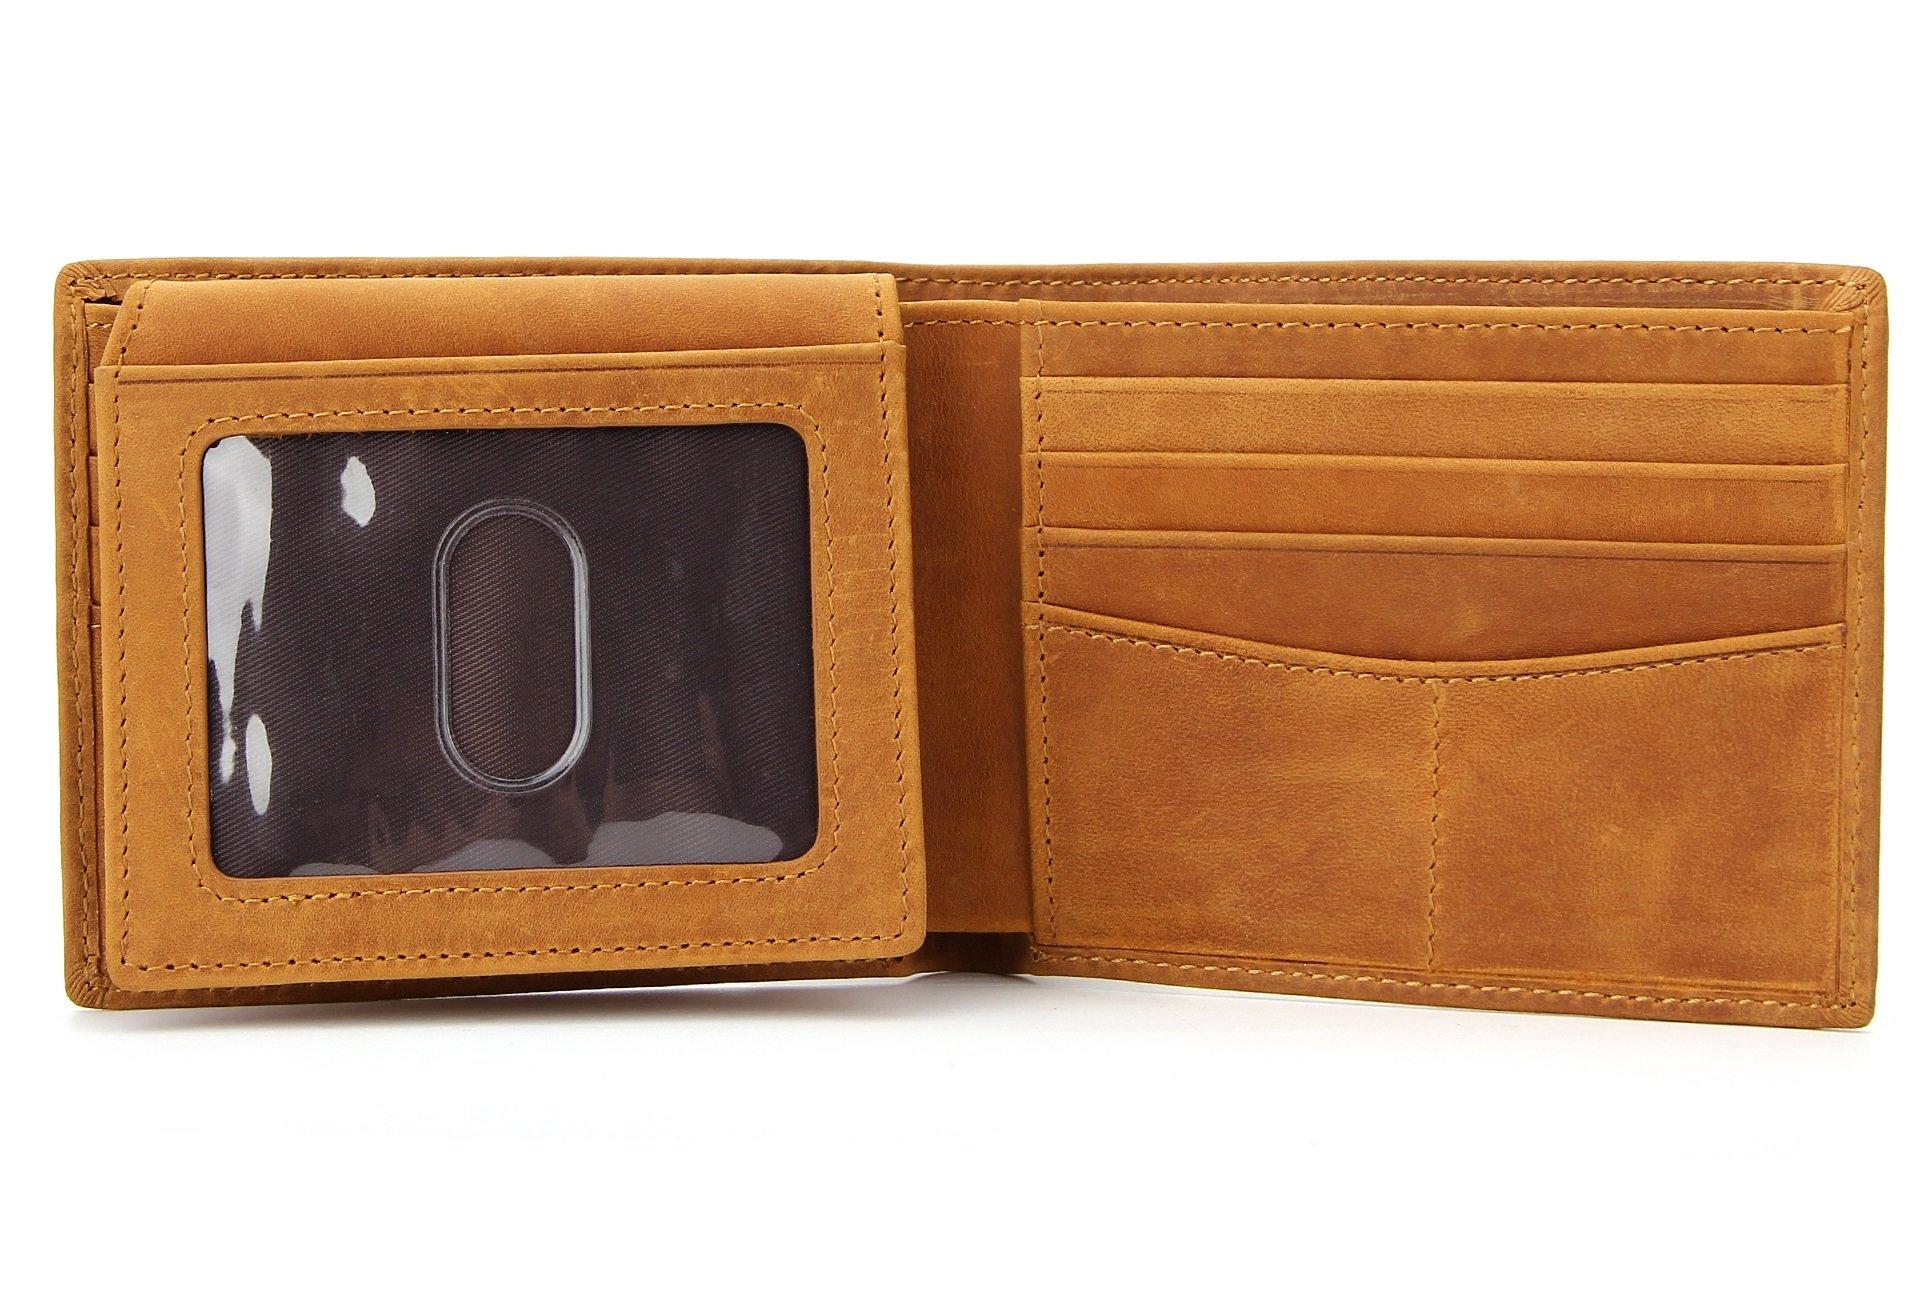 Wardeindesign Men's Leather Wallet Bifold RFID Designer engraved - and leather key fob